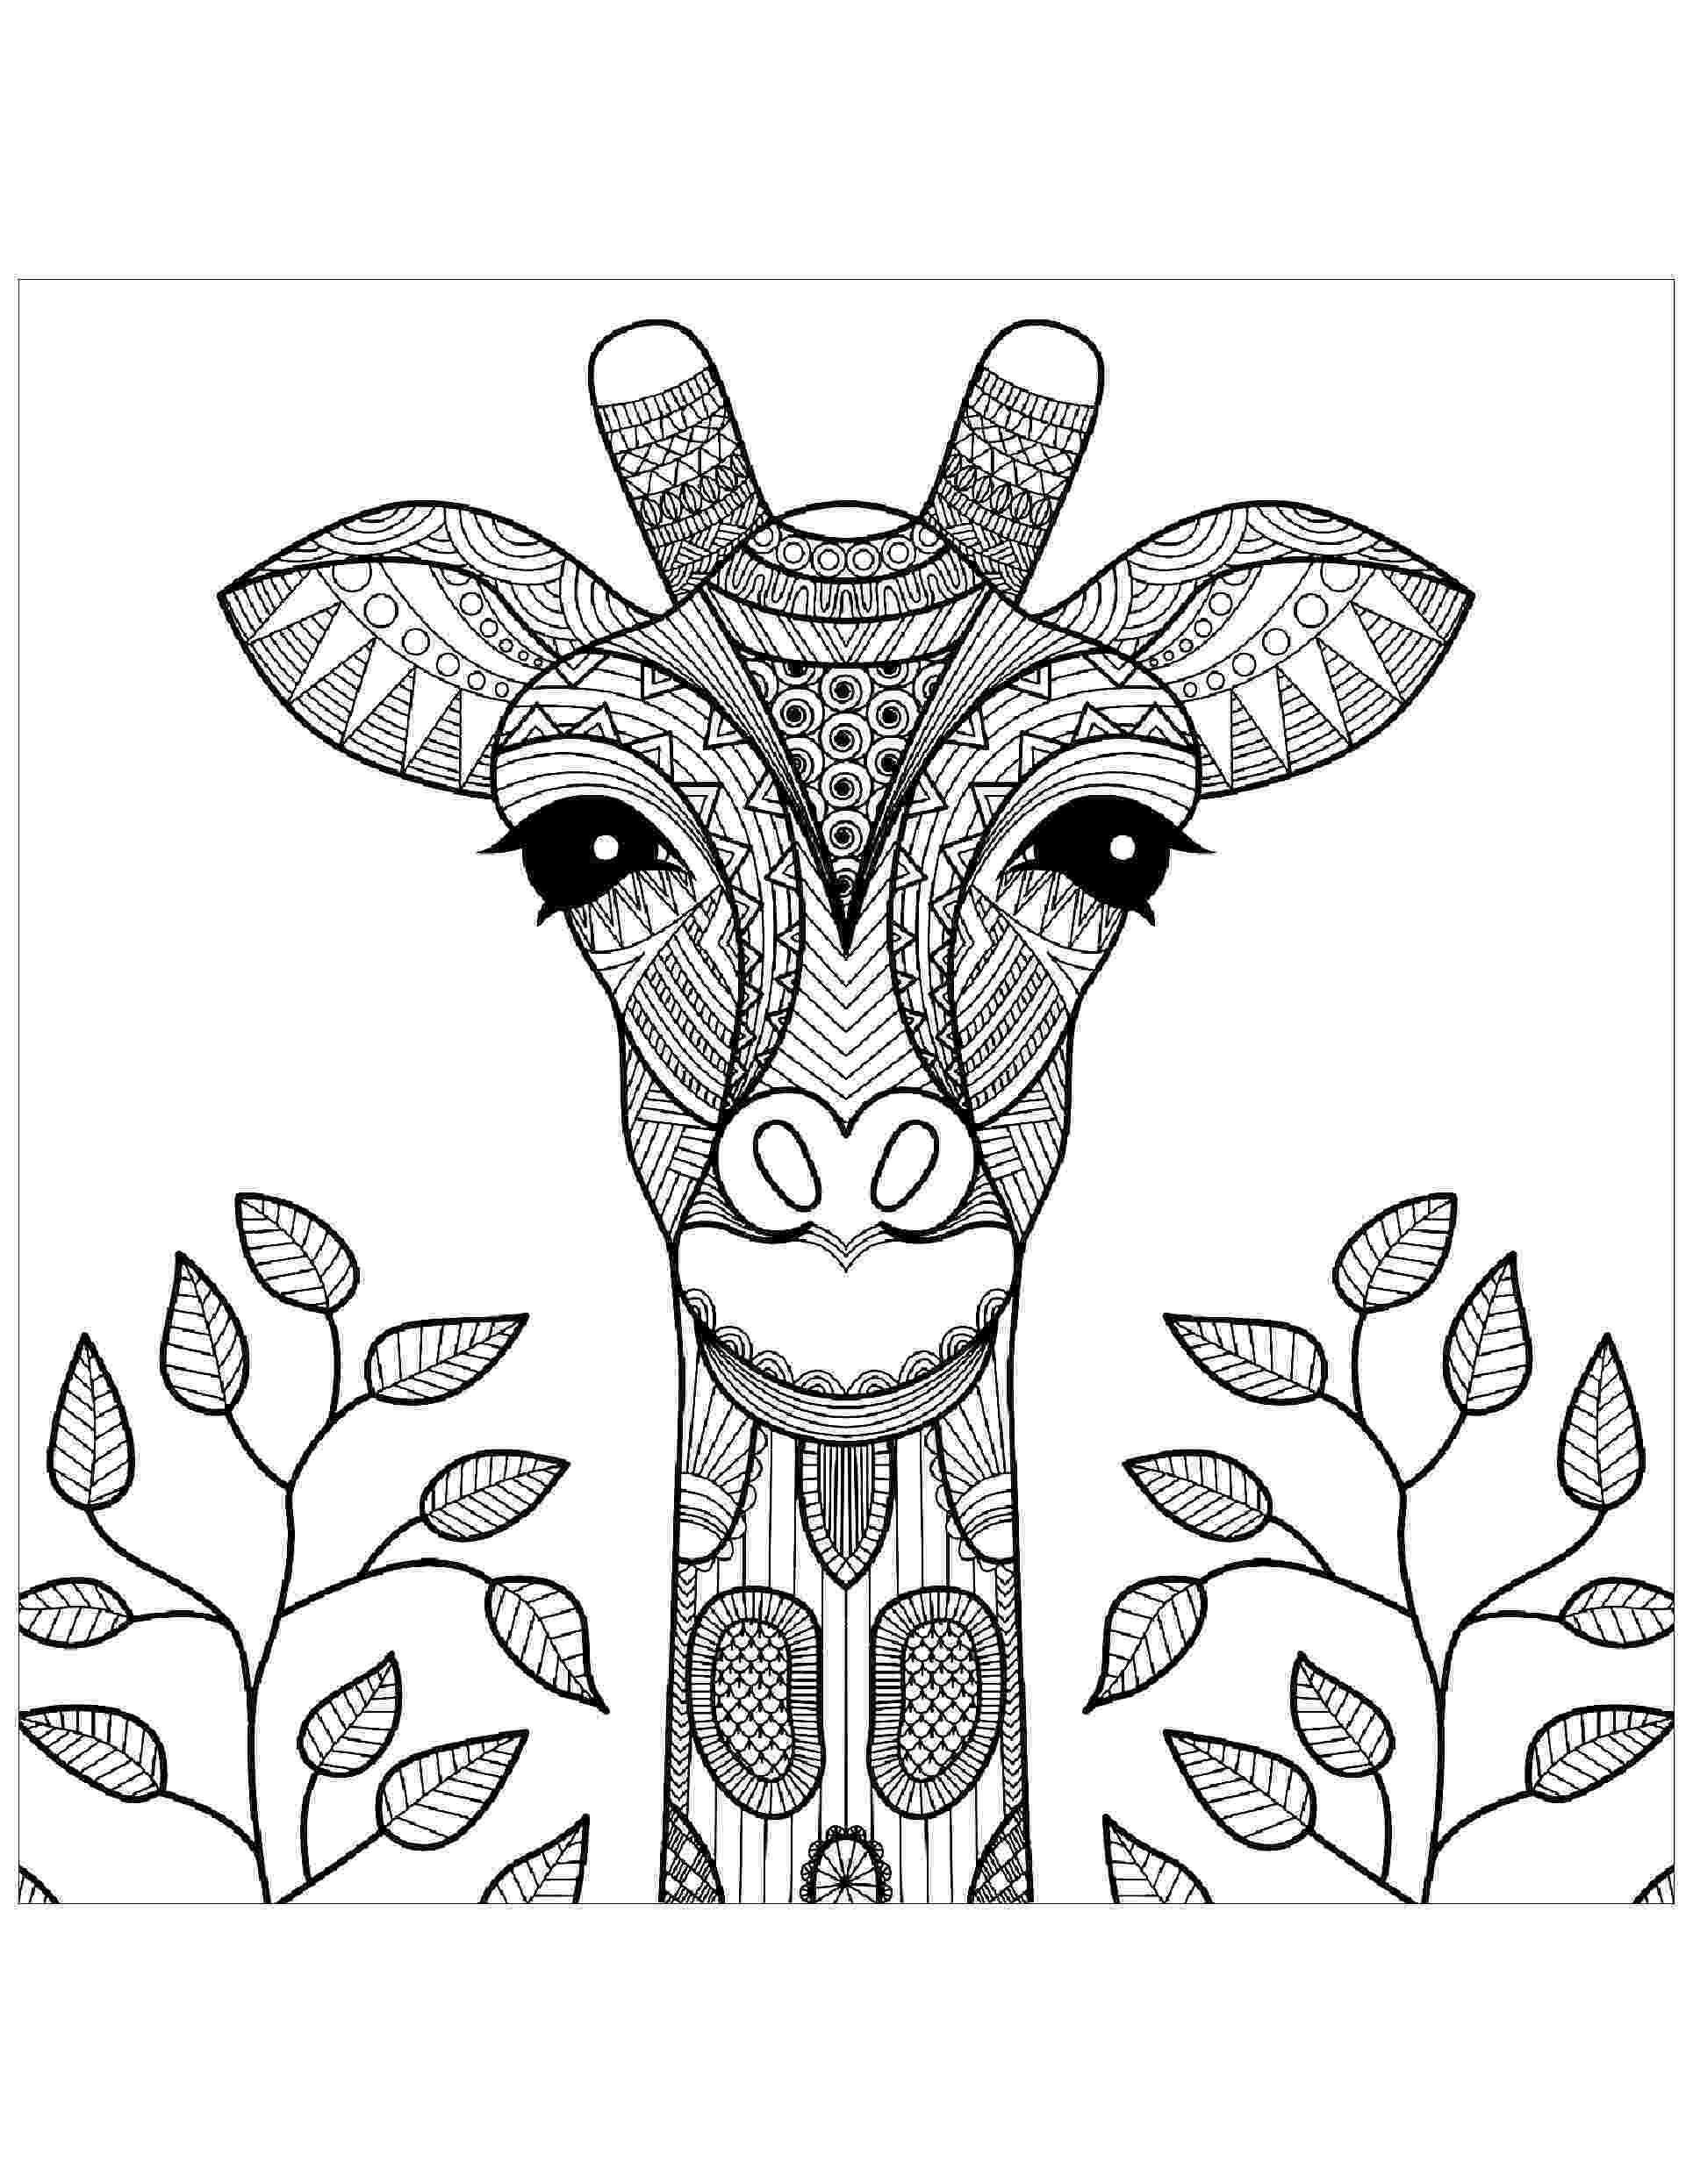 colouring sheet giraffe learning friends ms giraffe coloring printable sheet giraffe colouring